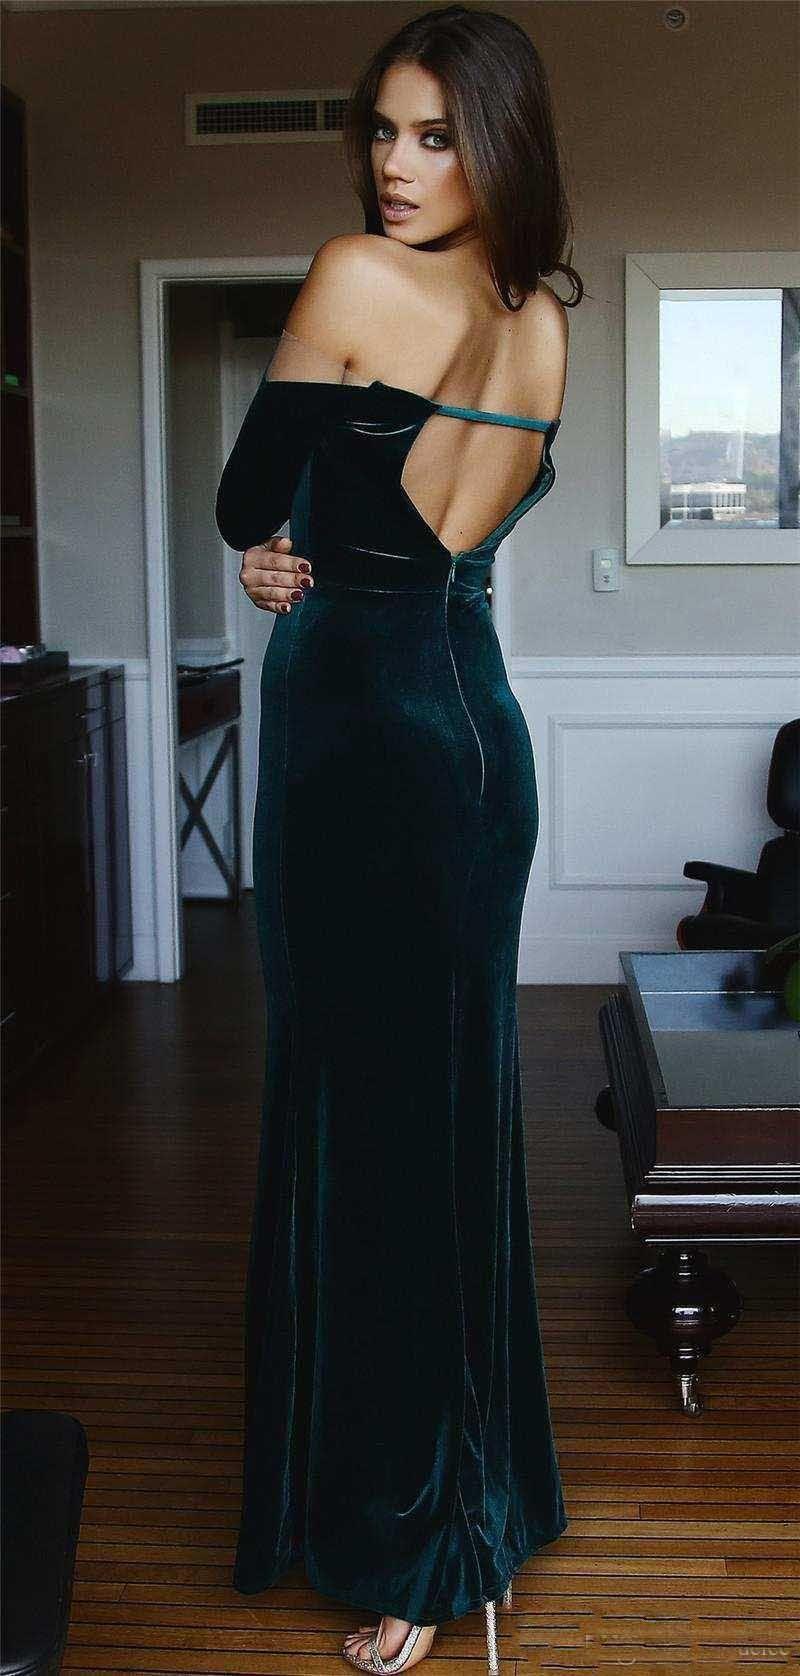 2018 Moda Sexy Scollatura a maniche lunghe Mermaid Prom Dresse Split Side velluto abiti da sera formale Backless Party Wear